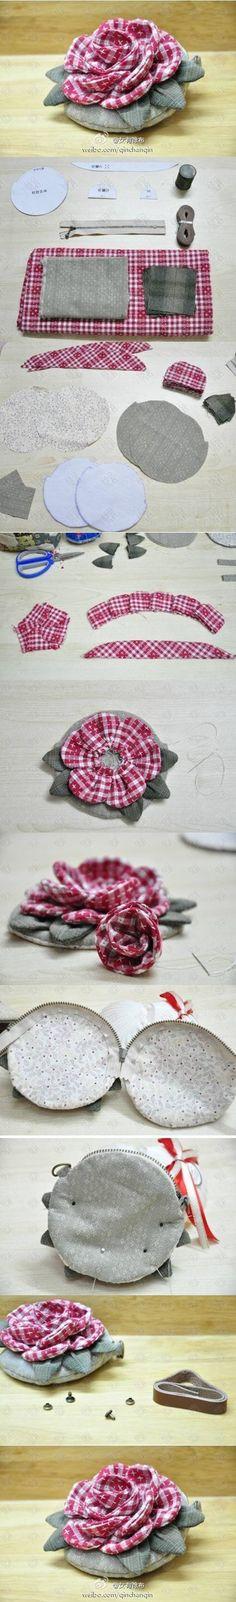 DIY Purse with Flower